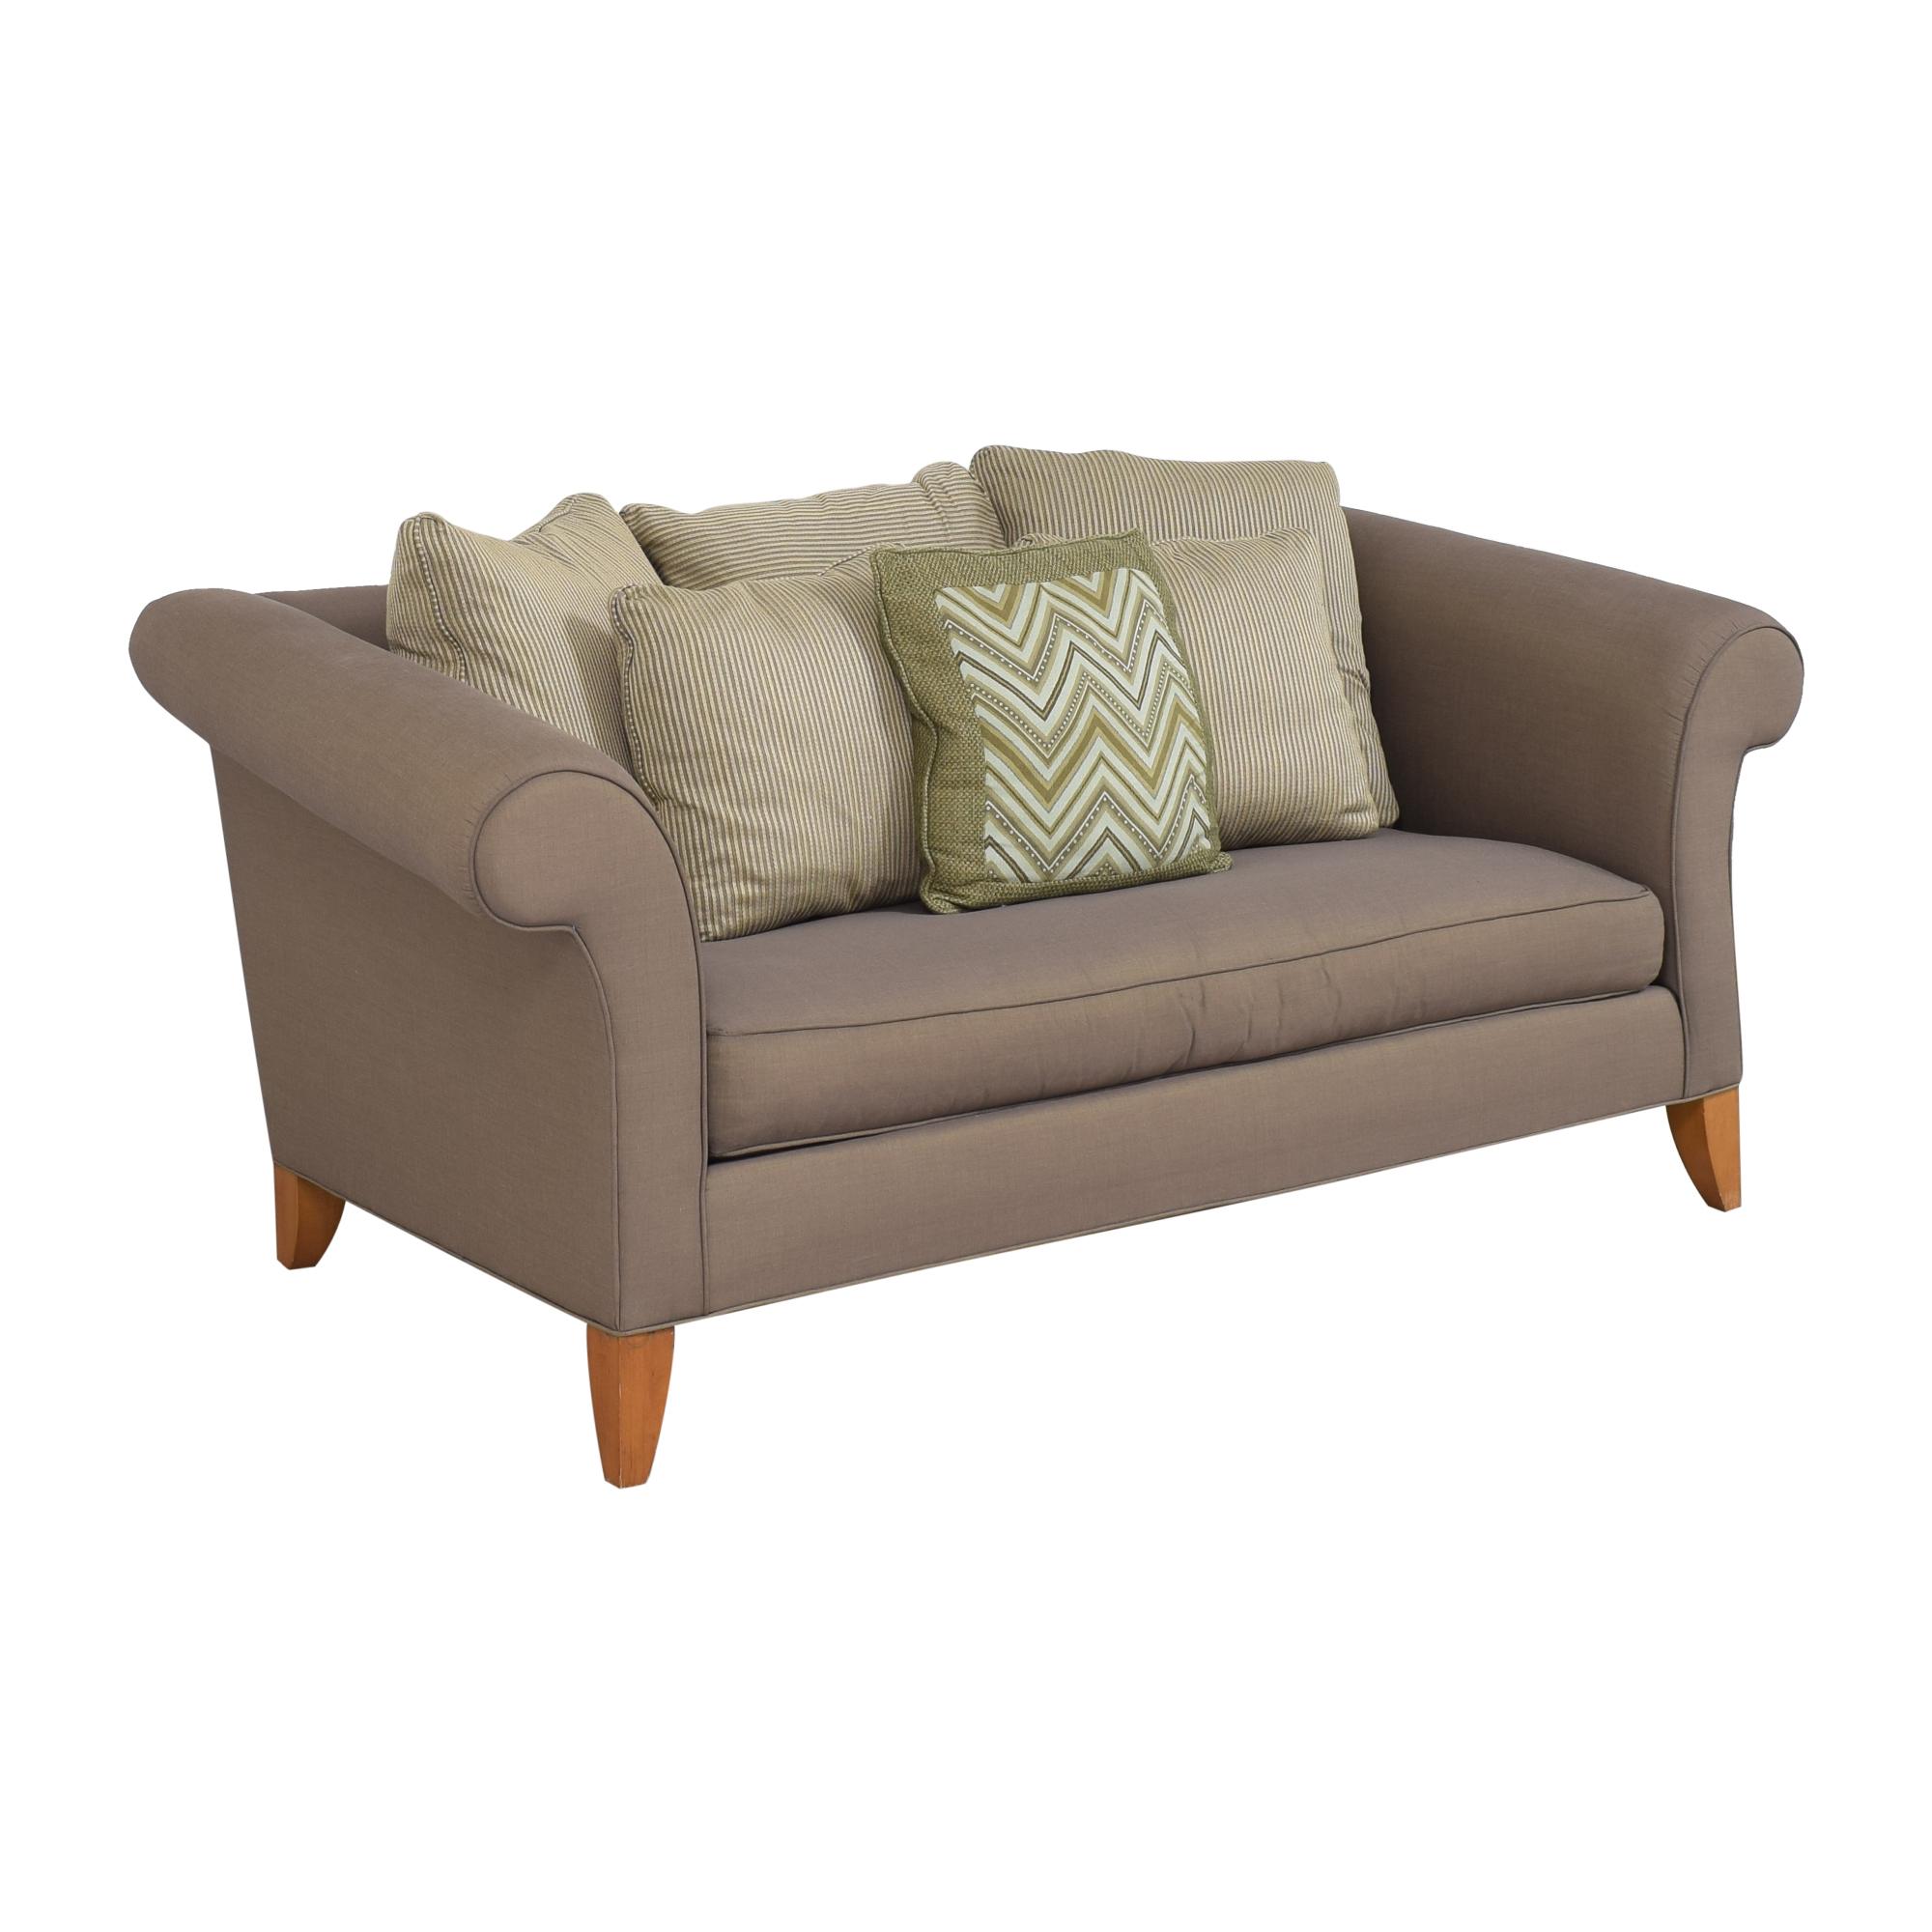 Ethan Allen Ethan Allen Shelter Sofa on sale